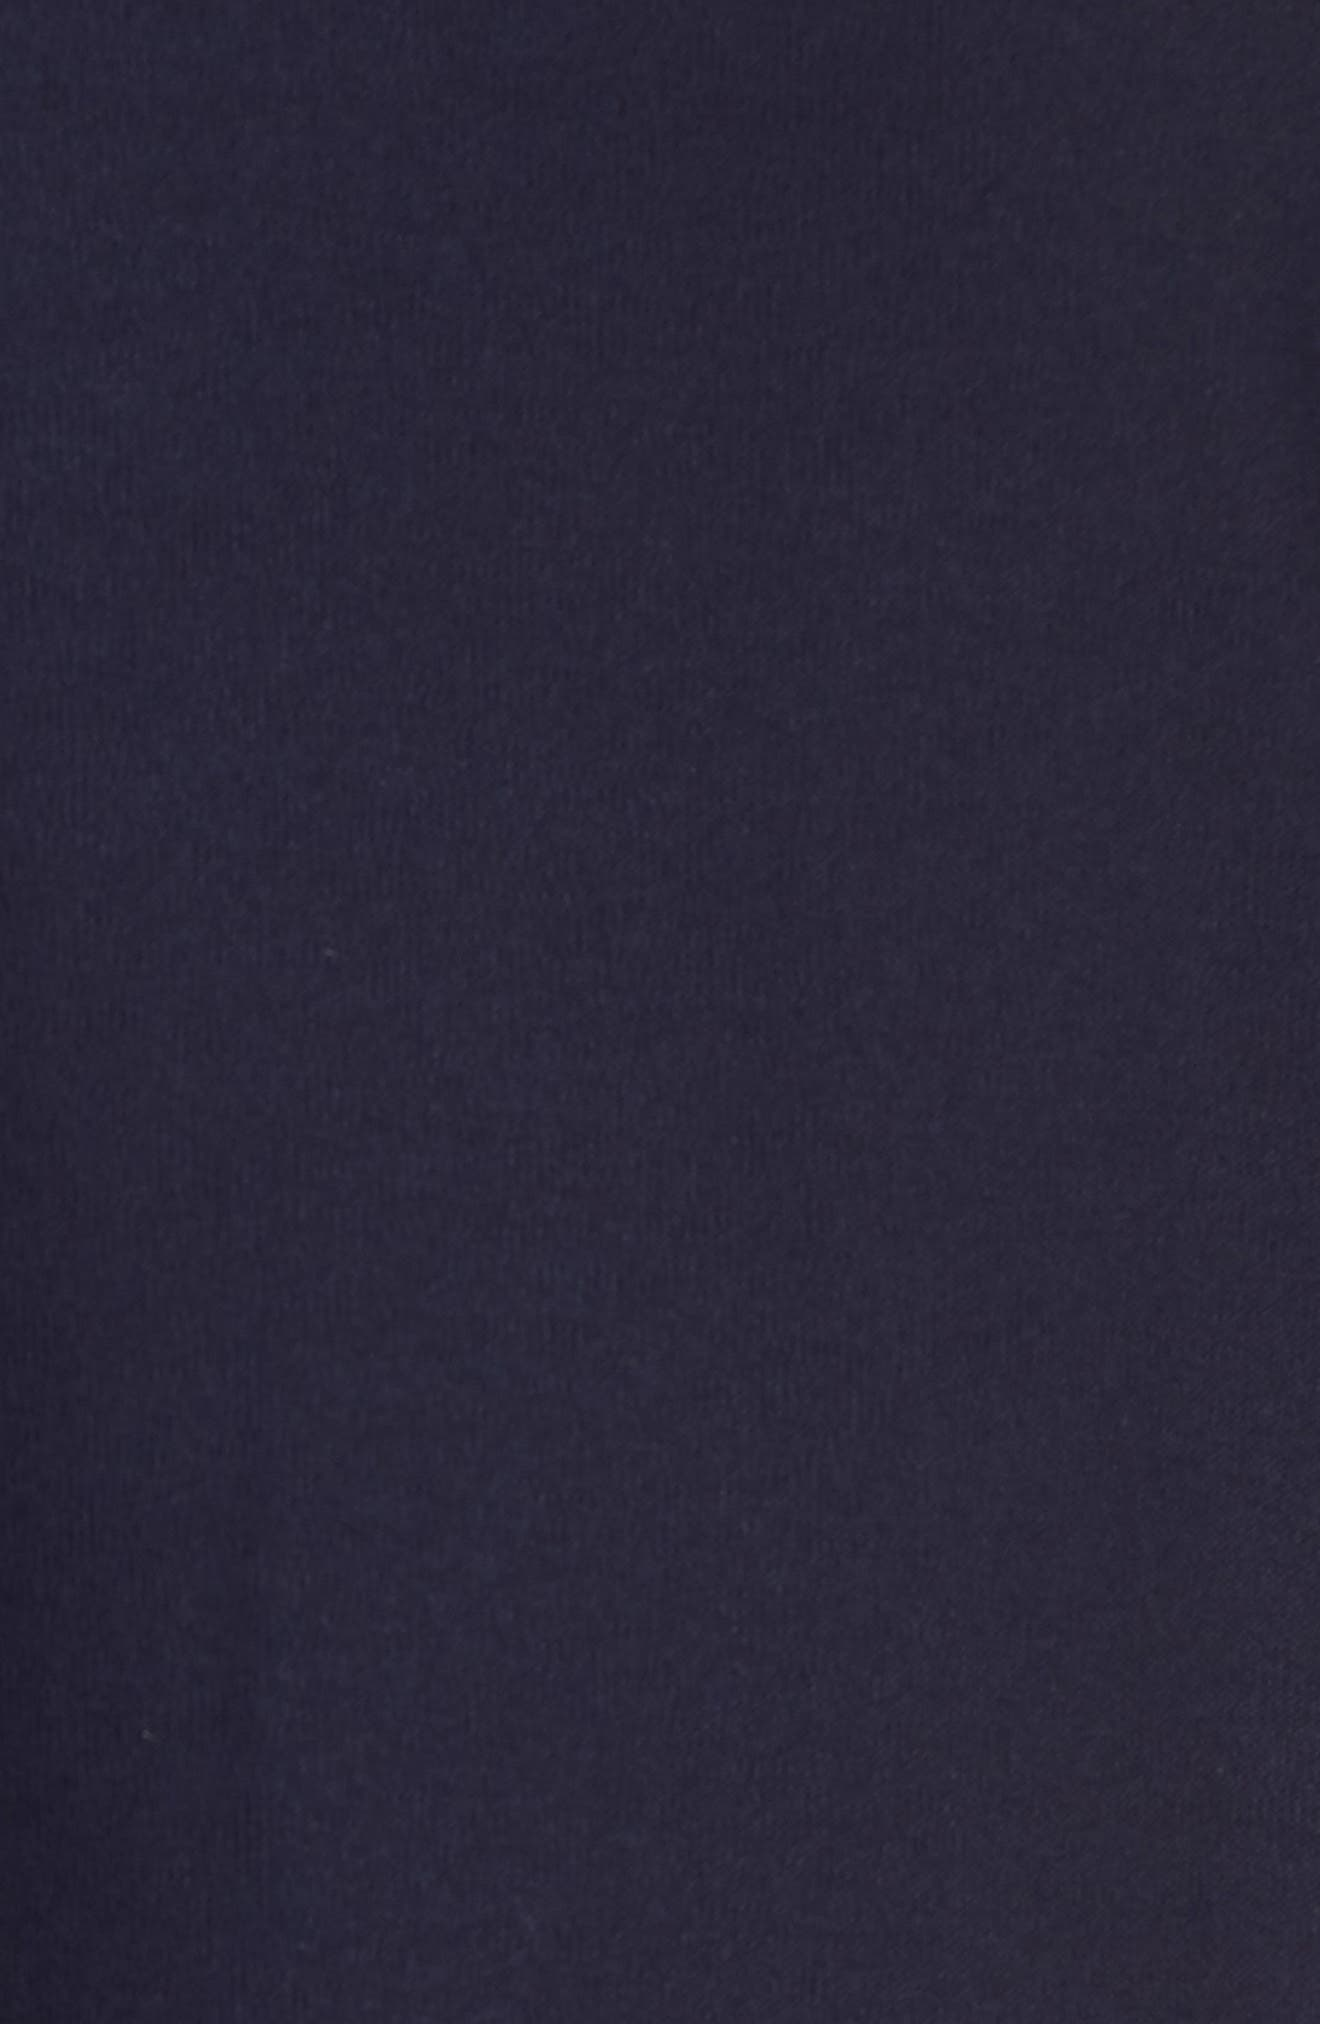 Stretch Knit Shift Dress,                             Alternate thumbnail 5, color,                             Midnight